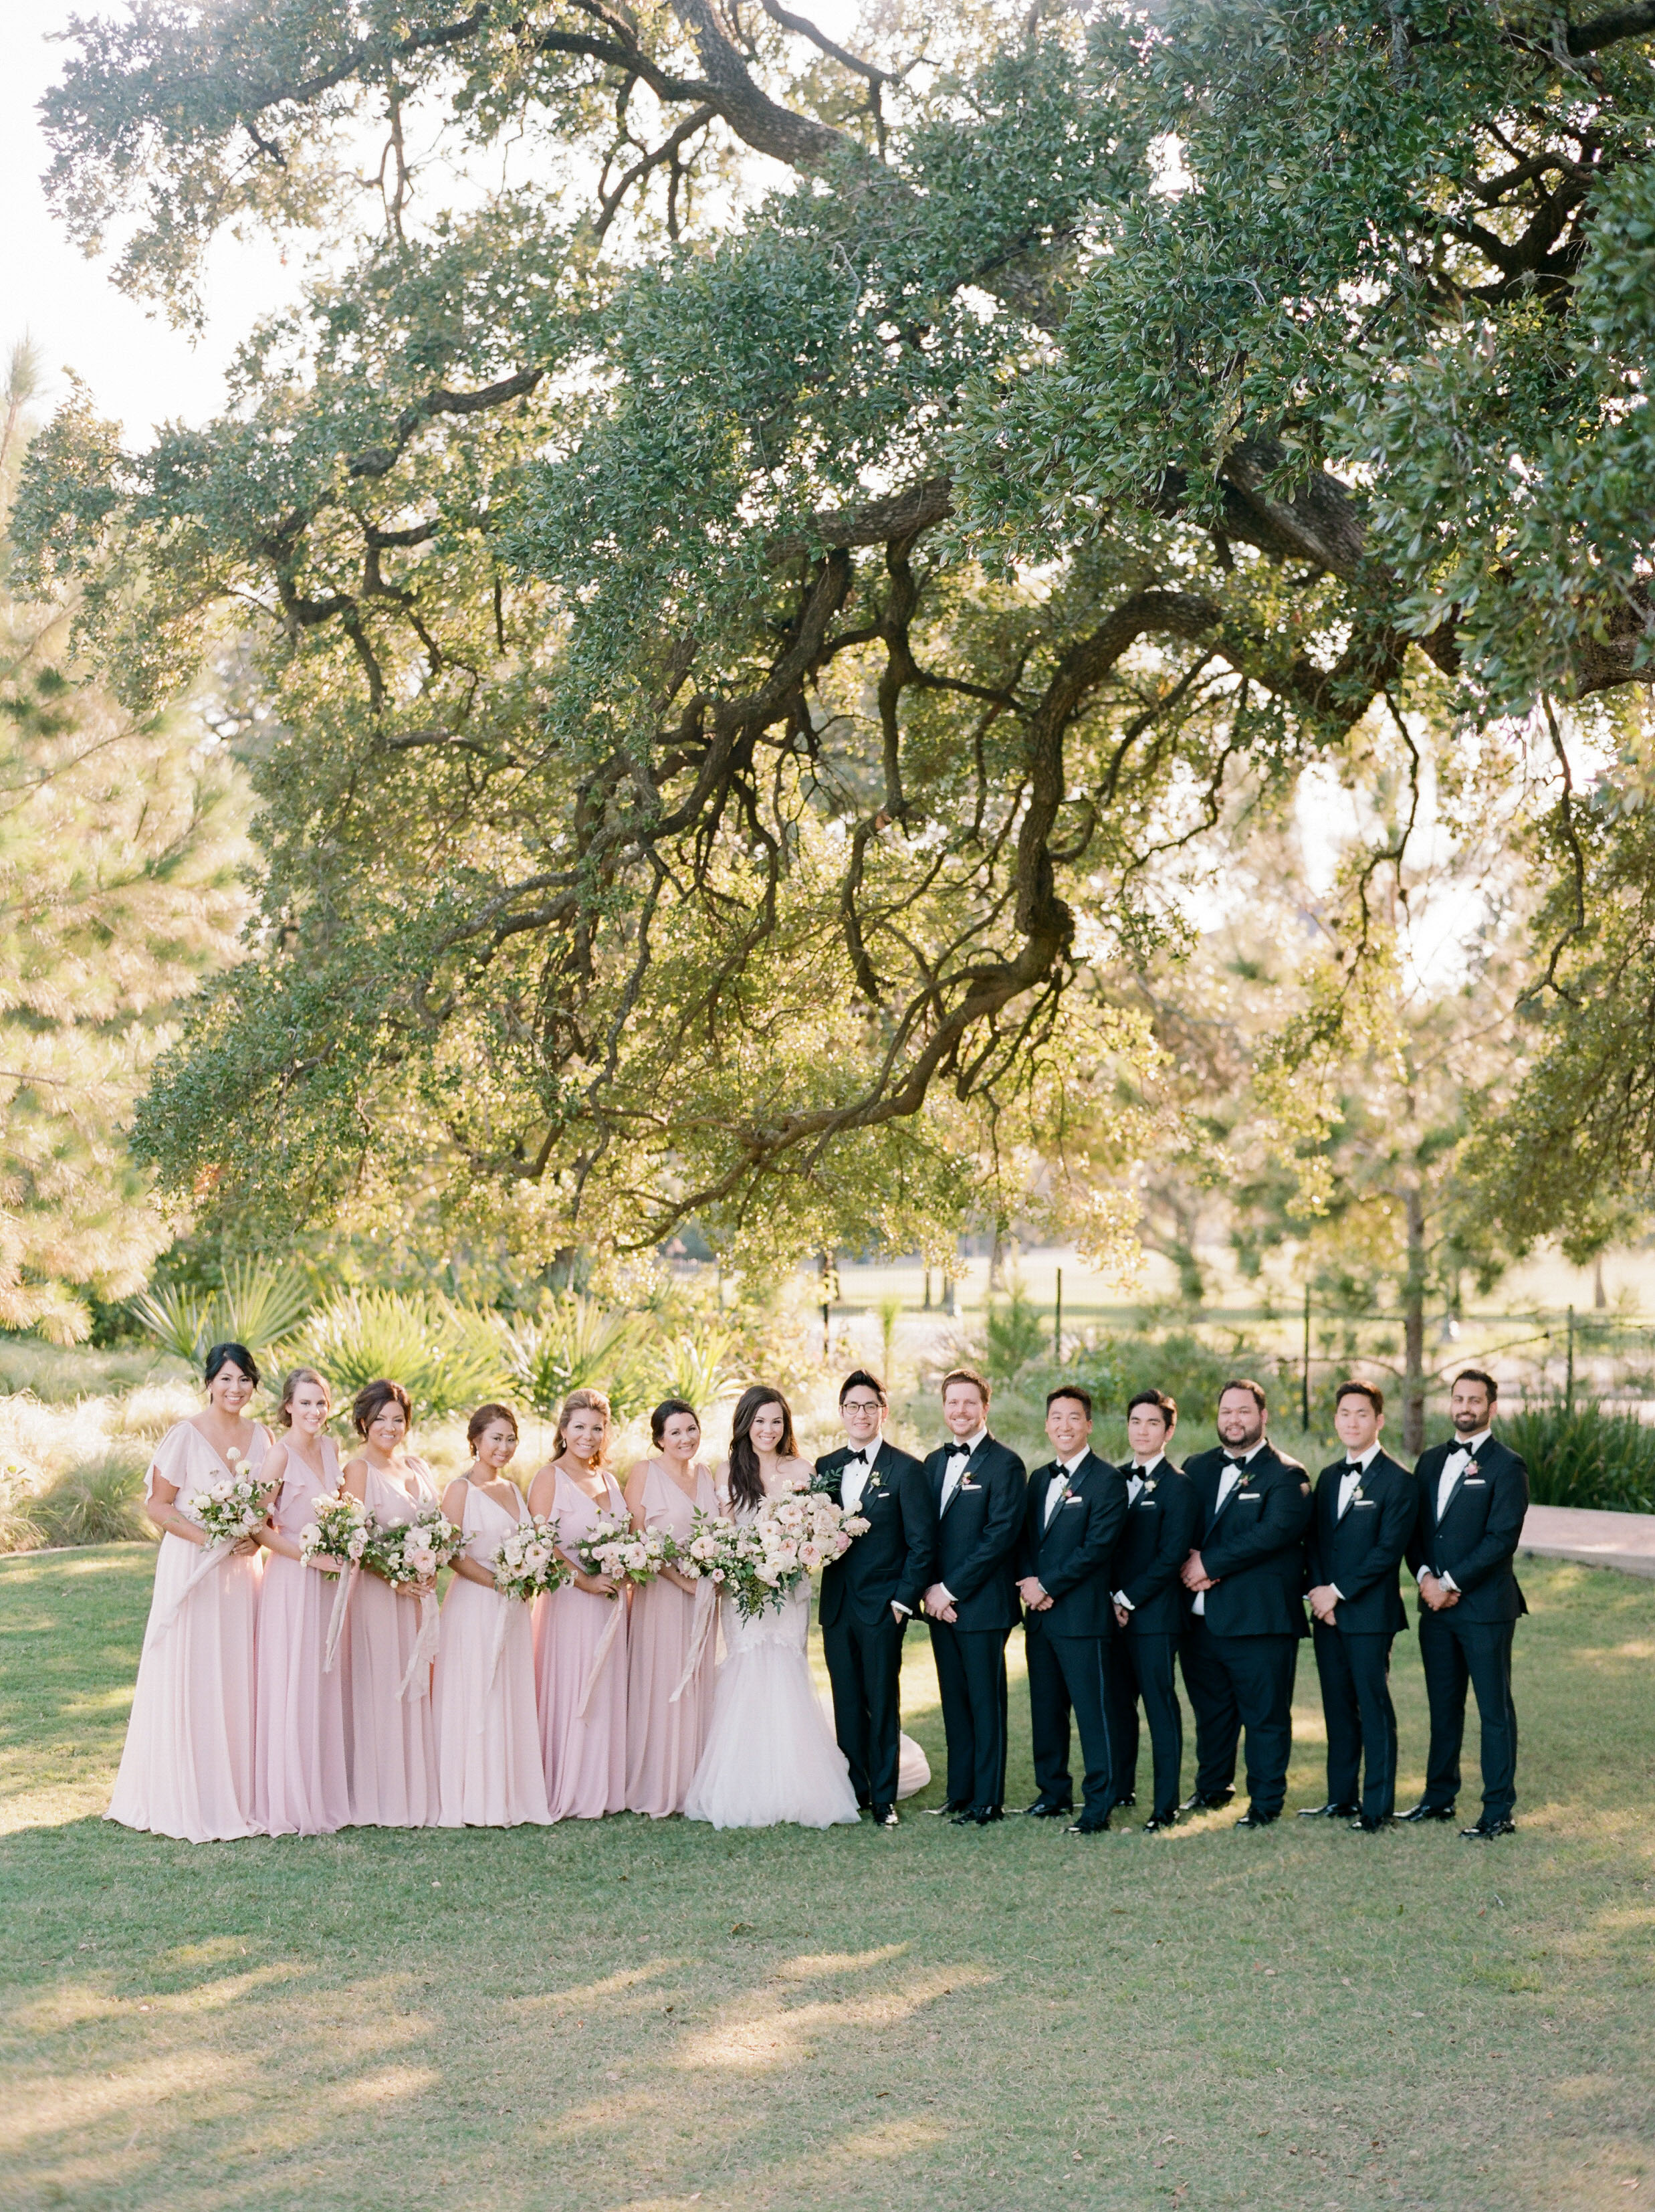 Martha-Stewart-Wedding-Dana-Fernandez-Photography-Josh-Texas-Film-Houston-Wedding-Fine-Art-Photographer-McGovern-Centennial-Gardens-Top-Best-187.jpg